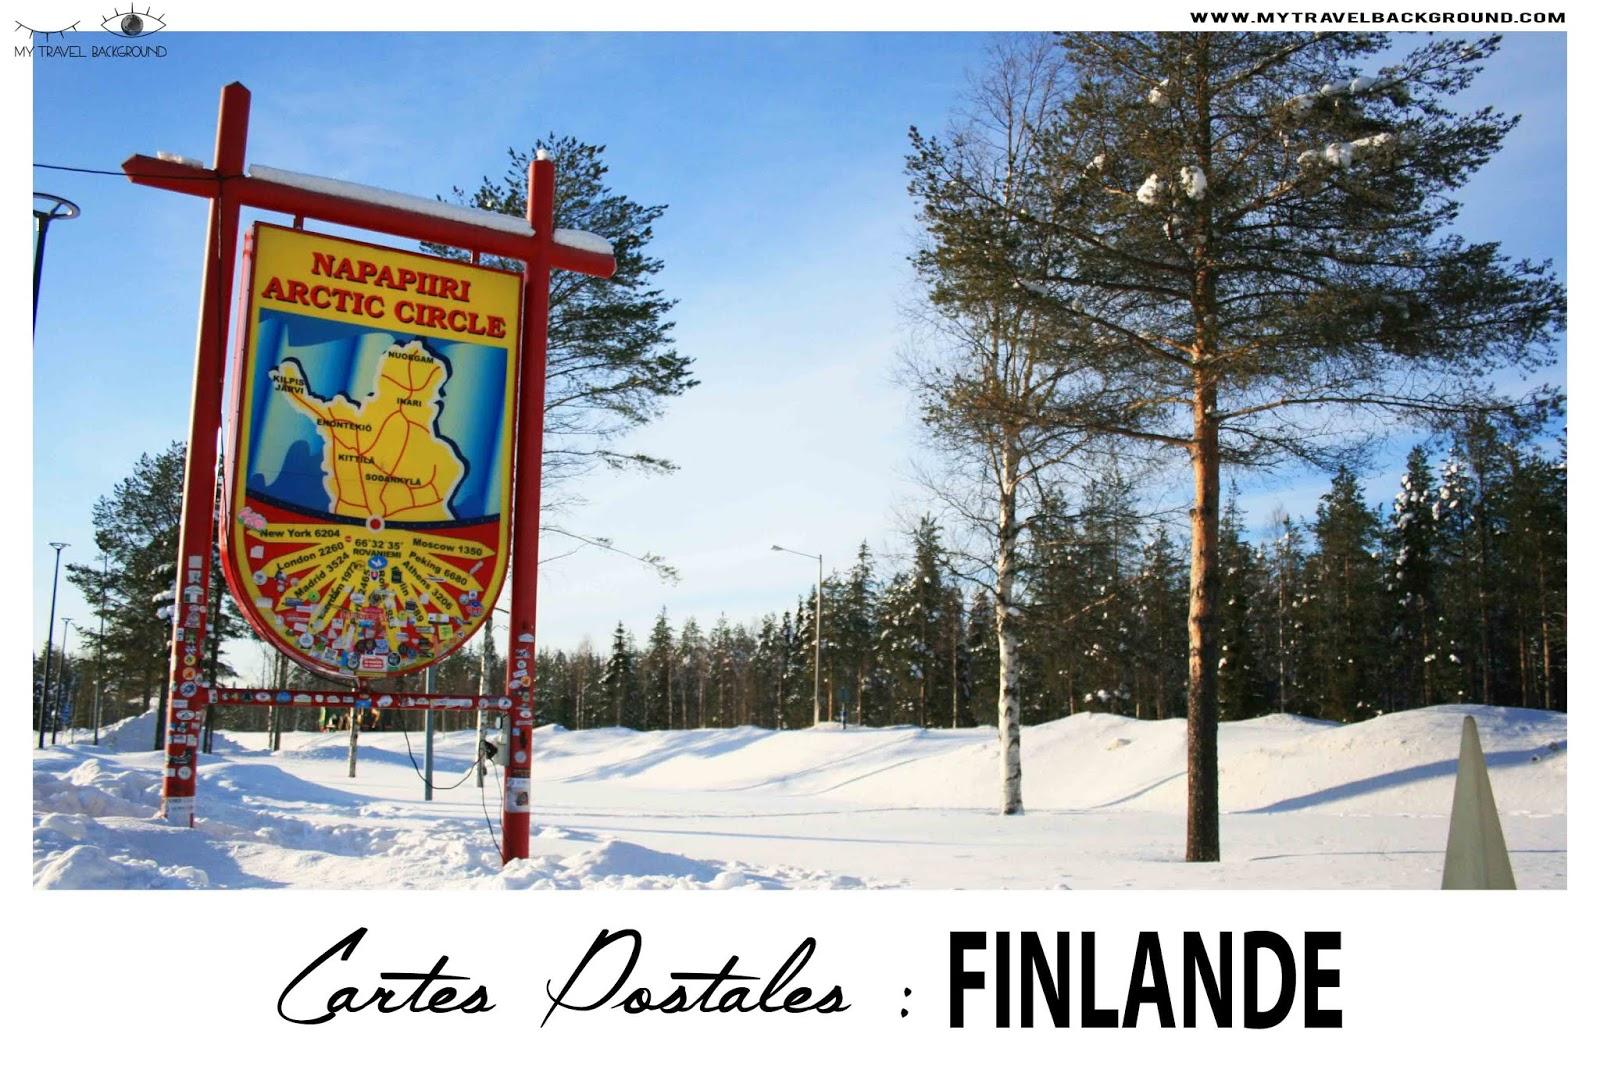 My Travel Background : carte postale de Finlande